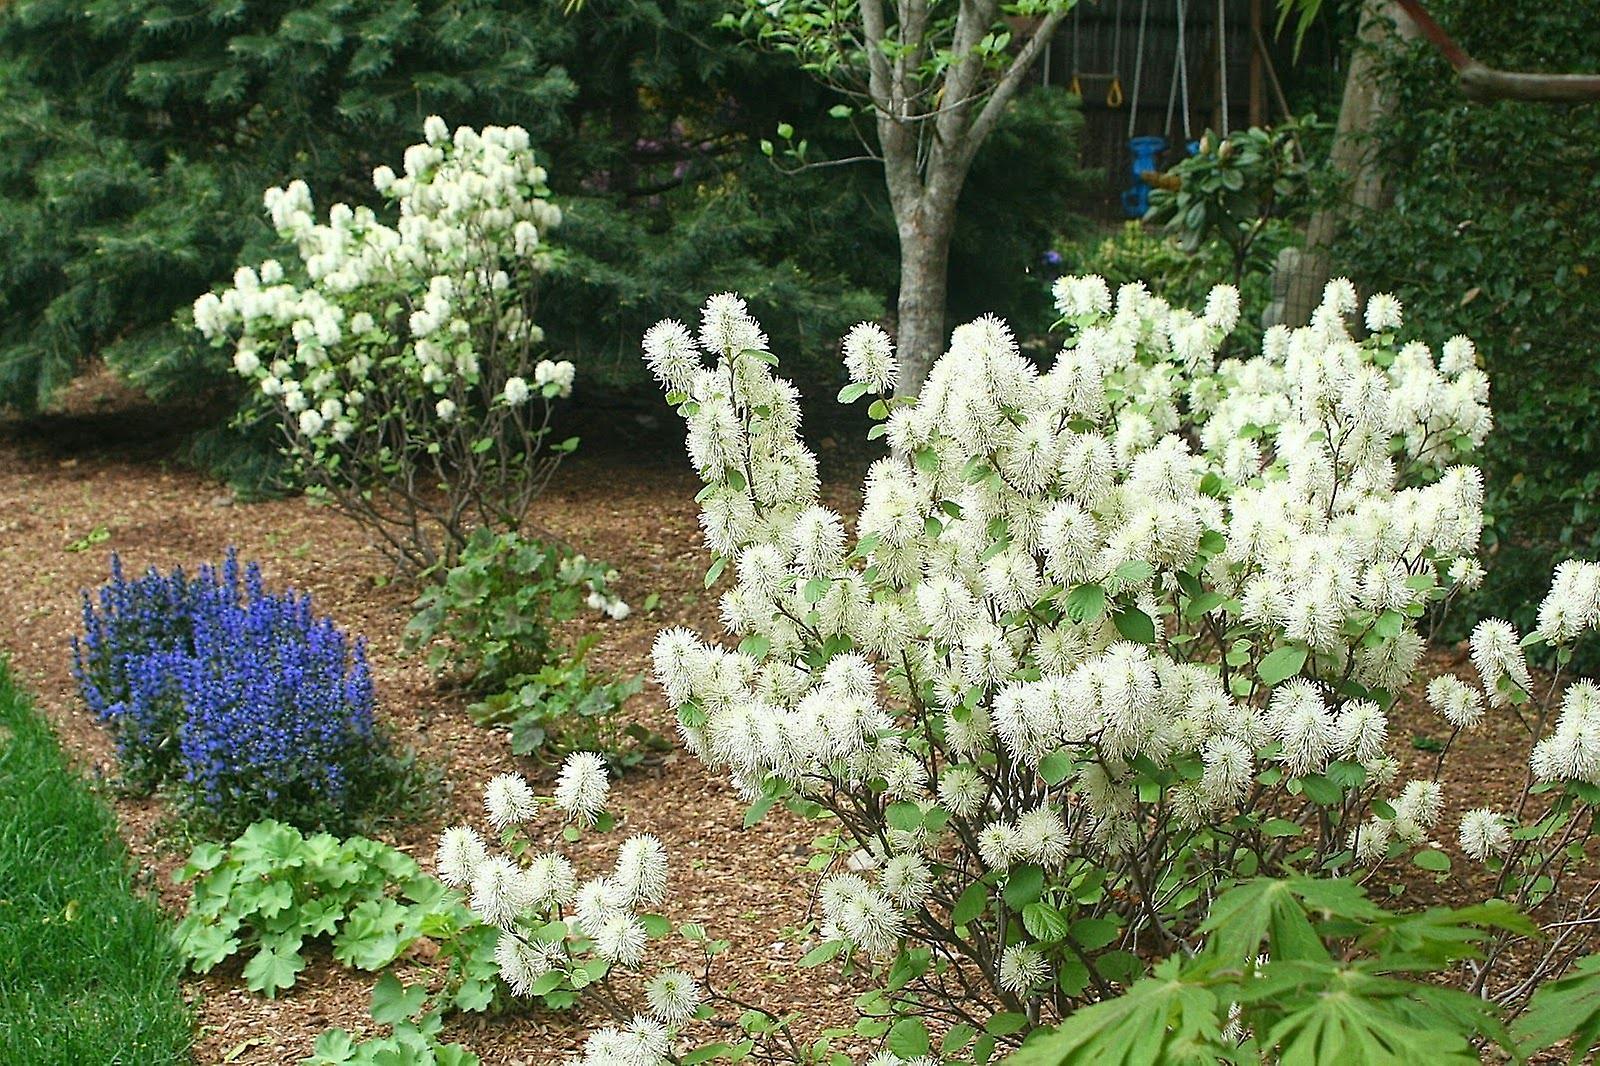 Fothergilla major - American Wych Hazel, Plant in 9cm Pot